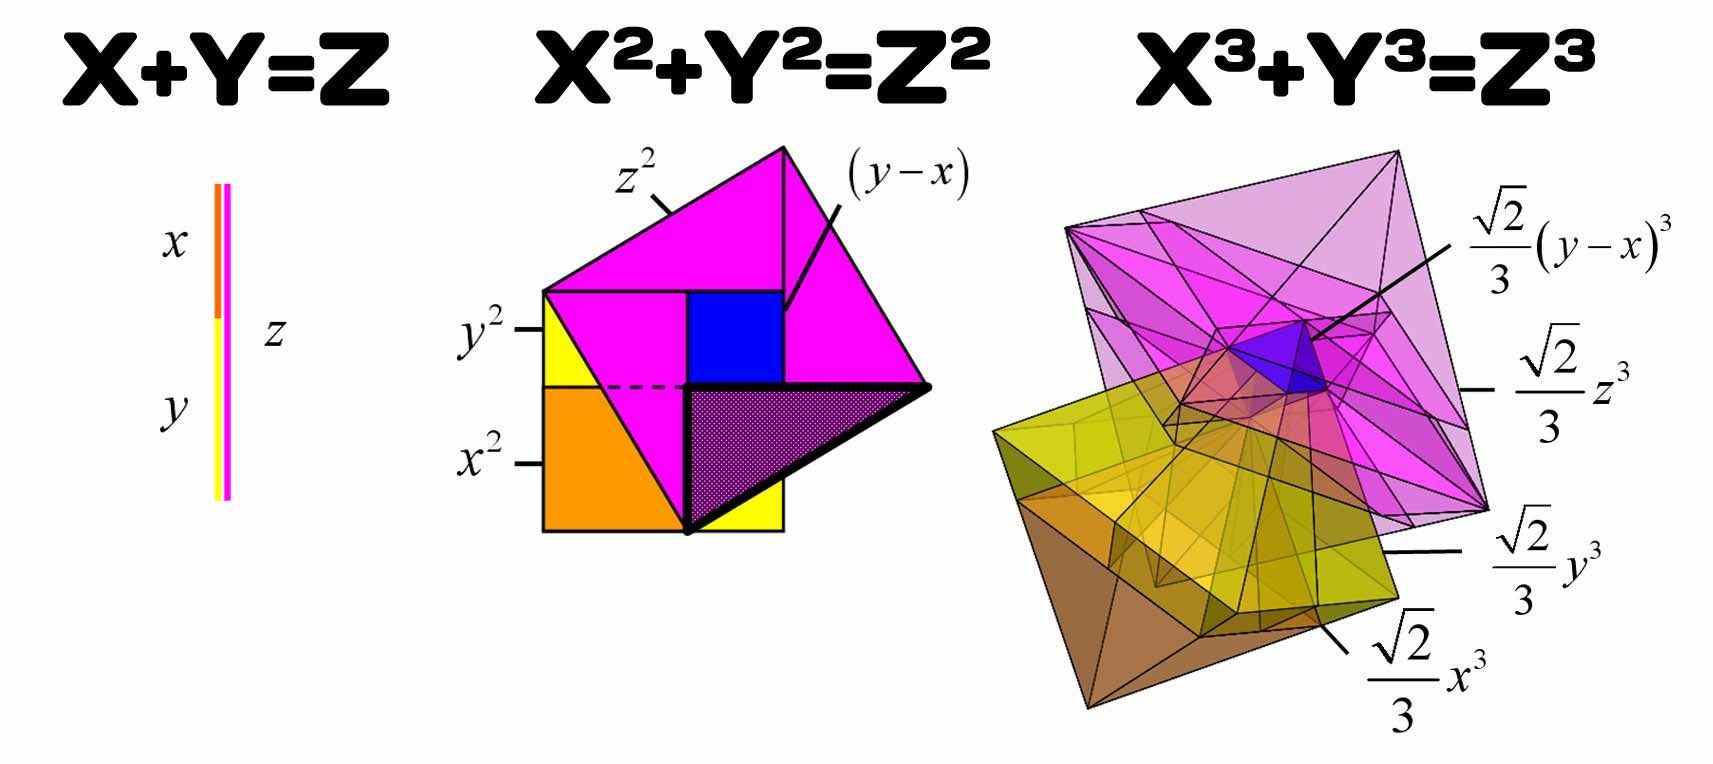 Pythagoras' Theorem Has Been Upgraded